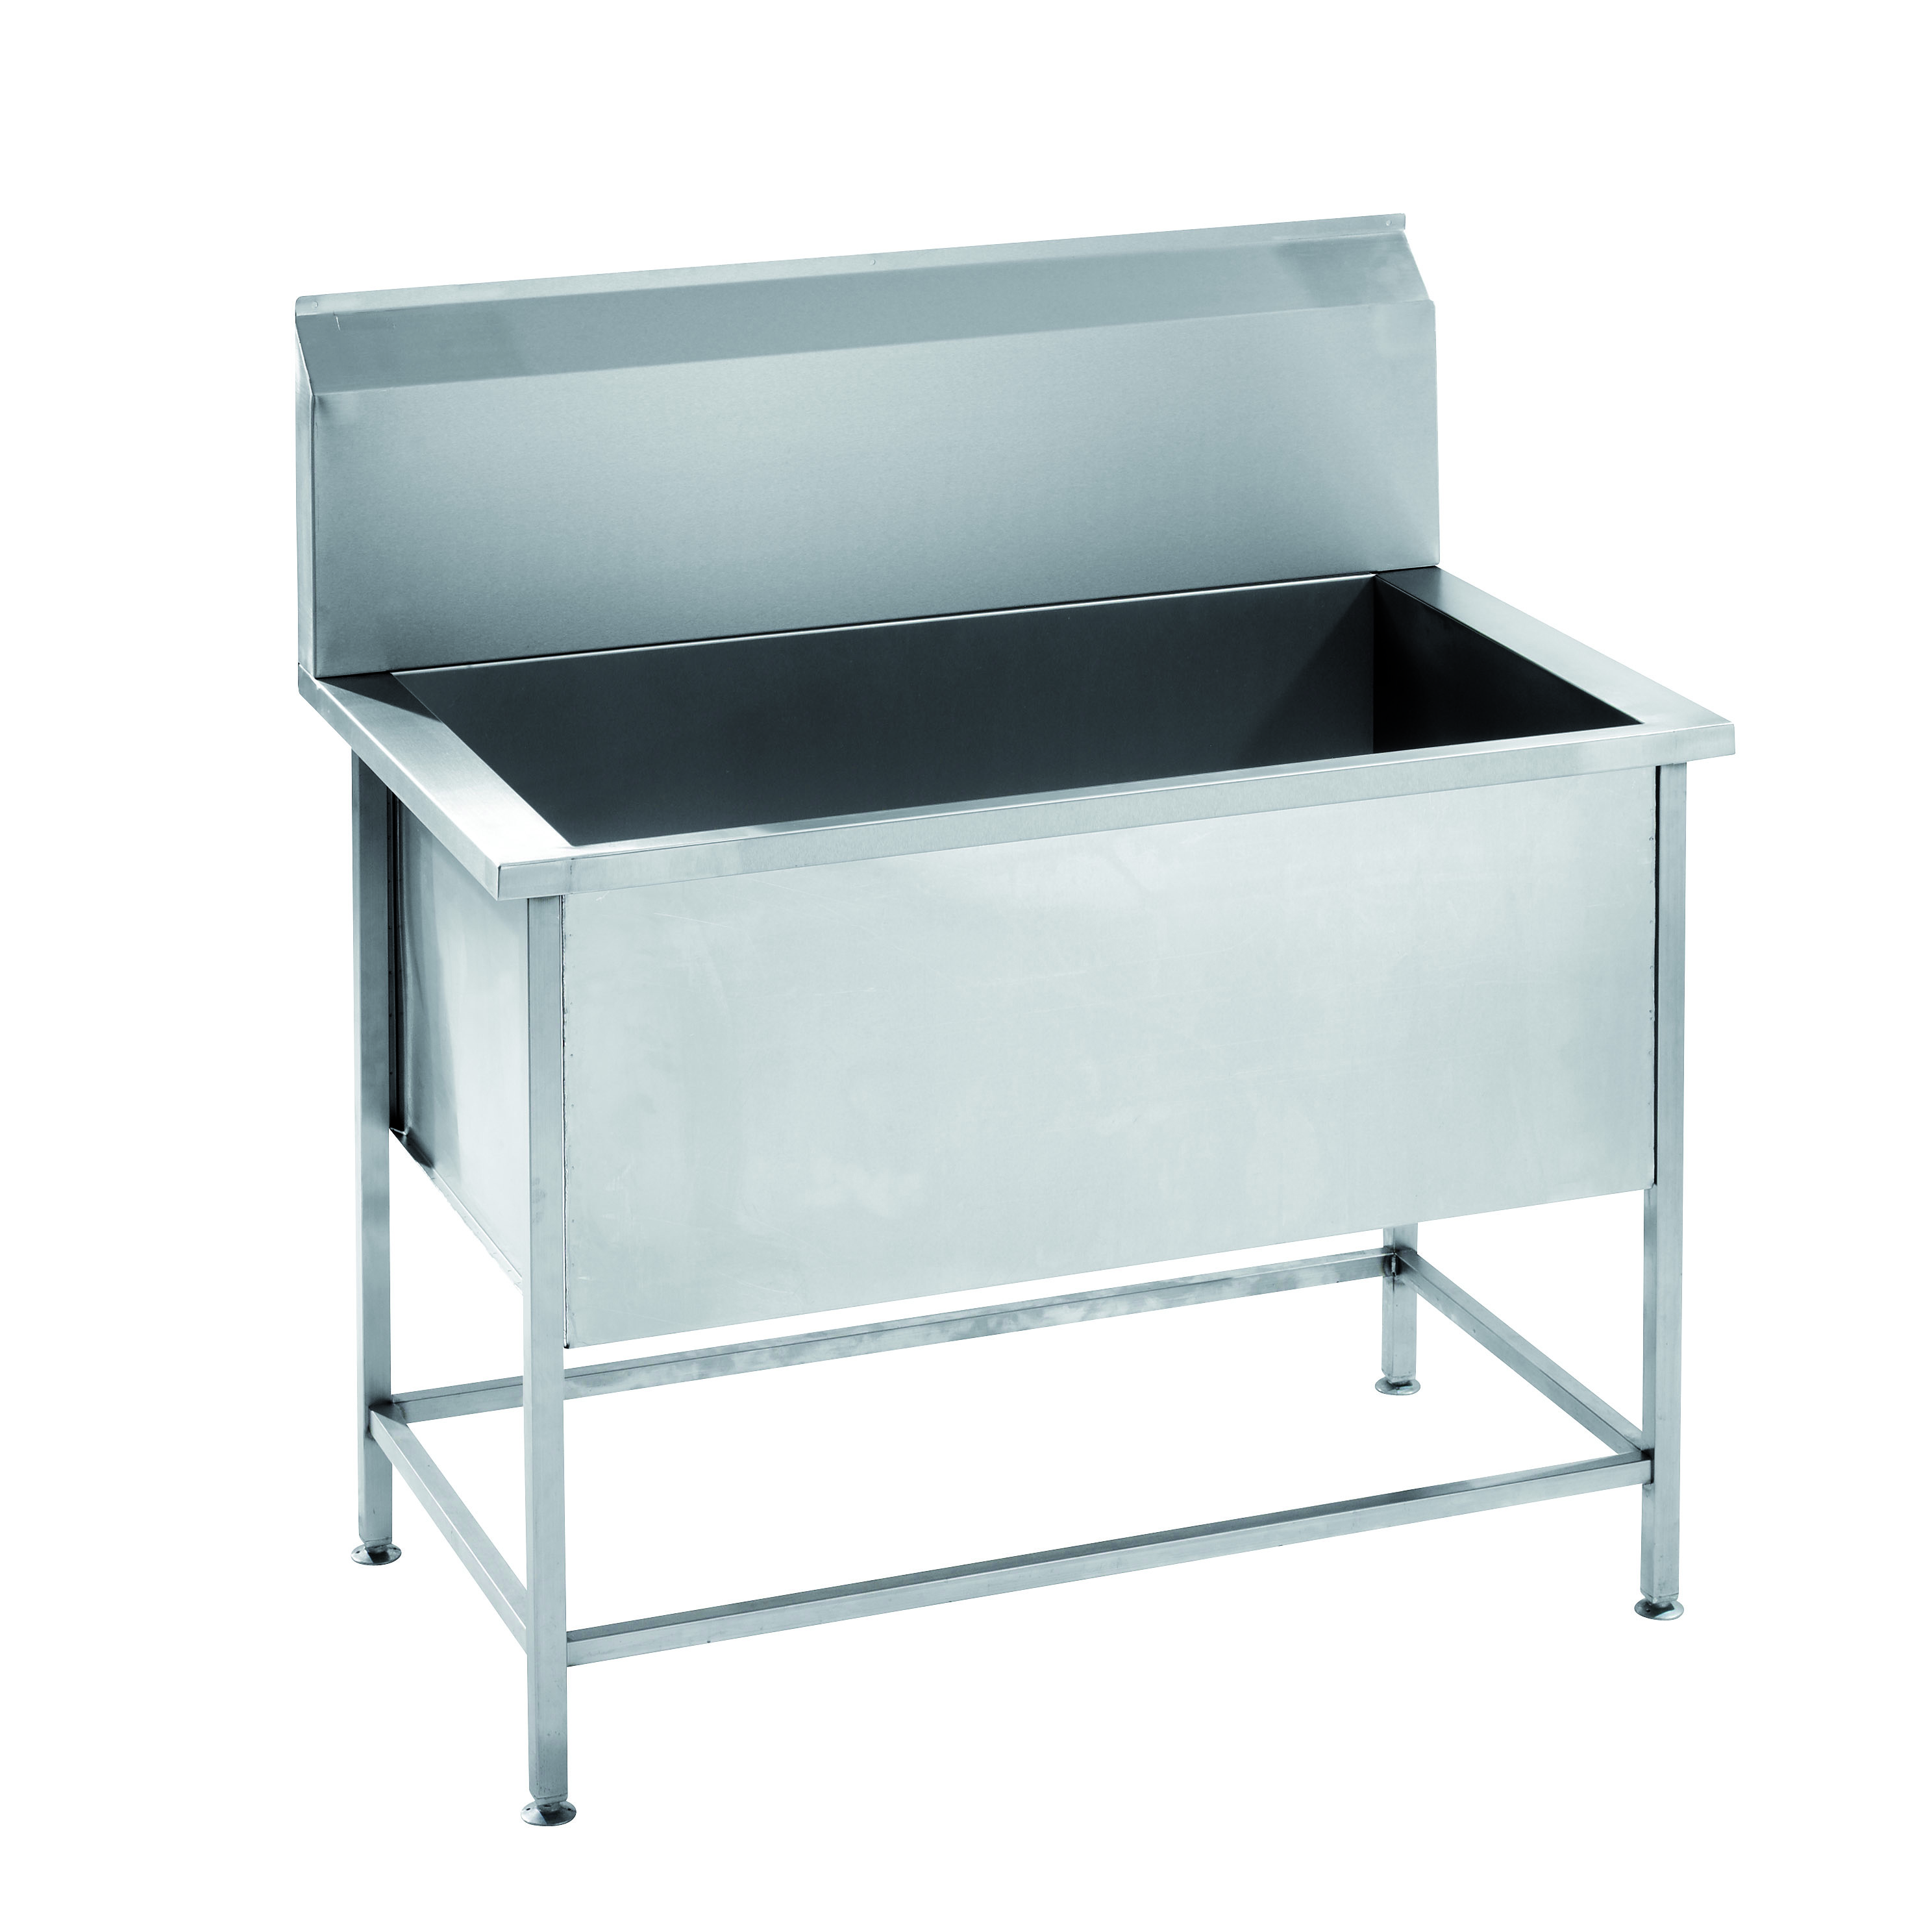 Utility Sink.Stainless Steel Utility Sink Usink